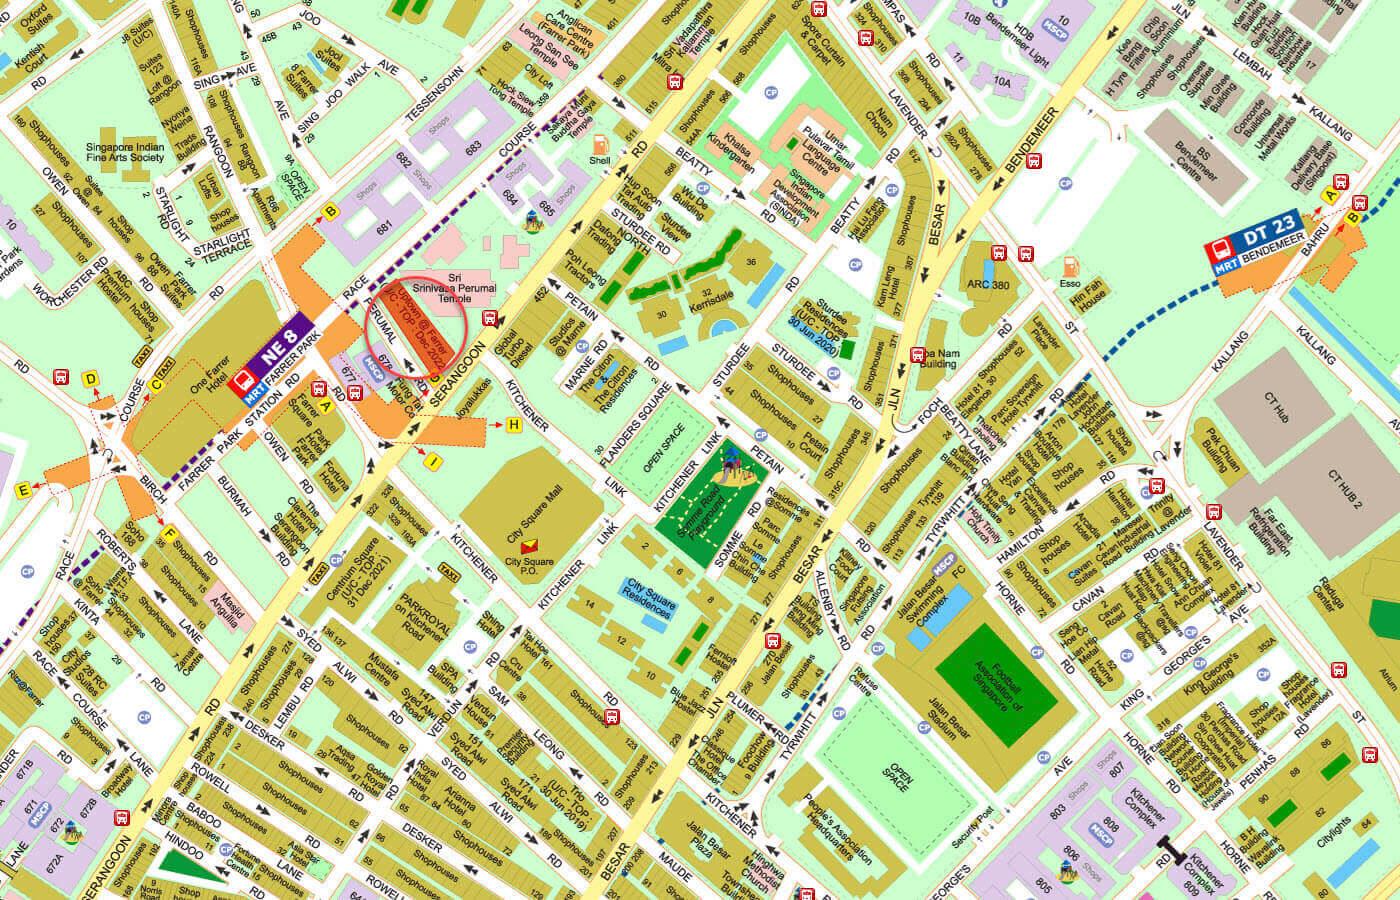 Uptown @ Farrer Condo Street Directory Map